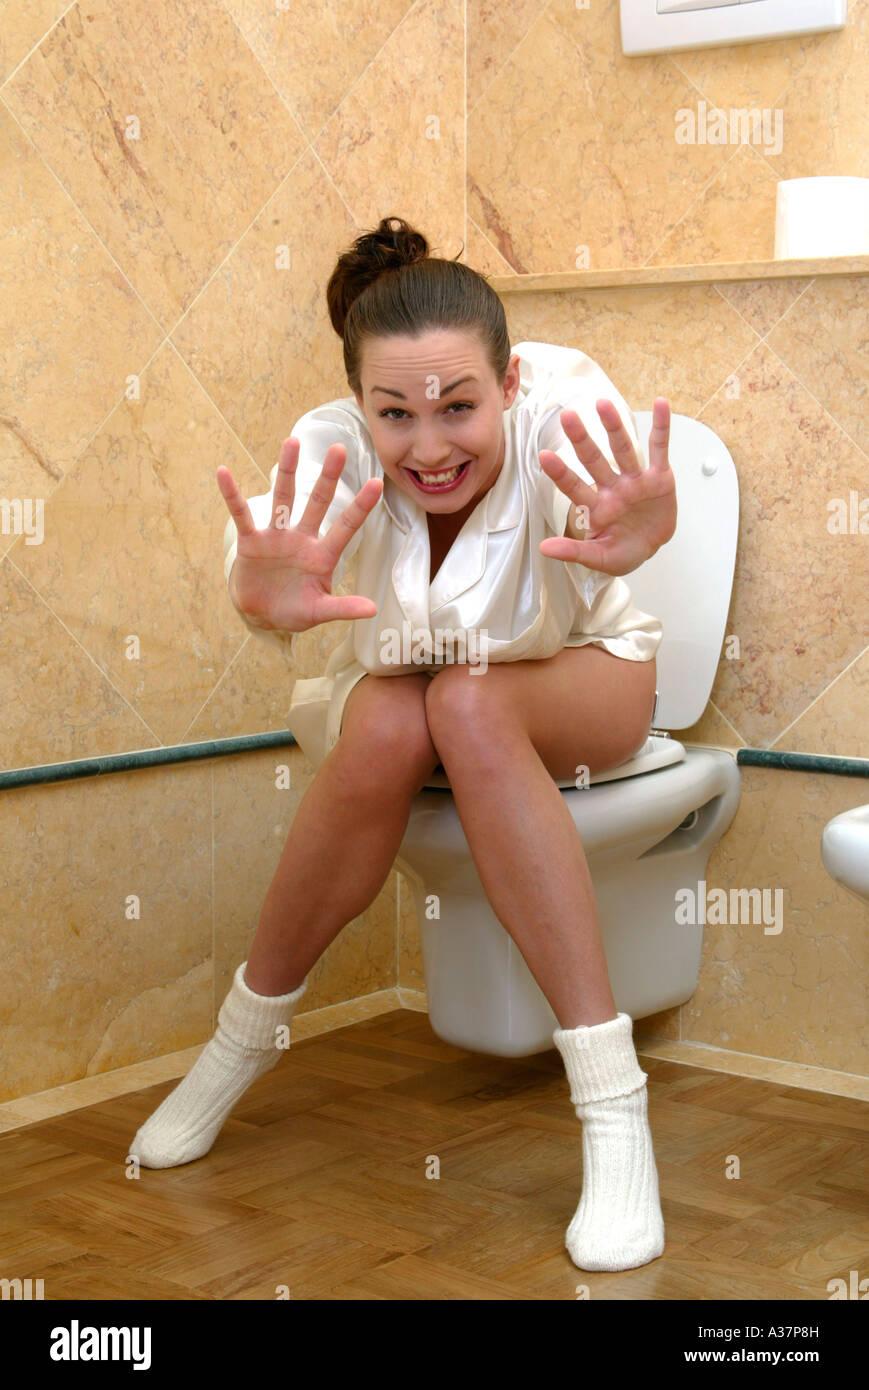 Woman Sitting On Toilet Stock Photos  Woman Sitting On